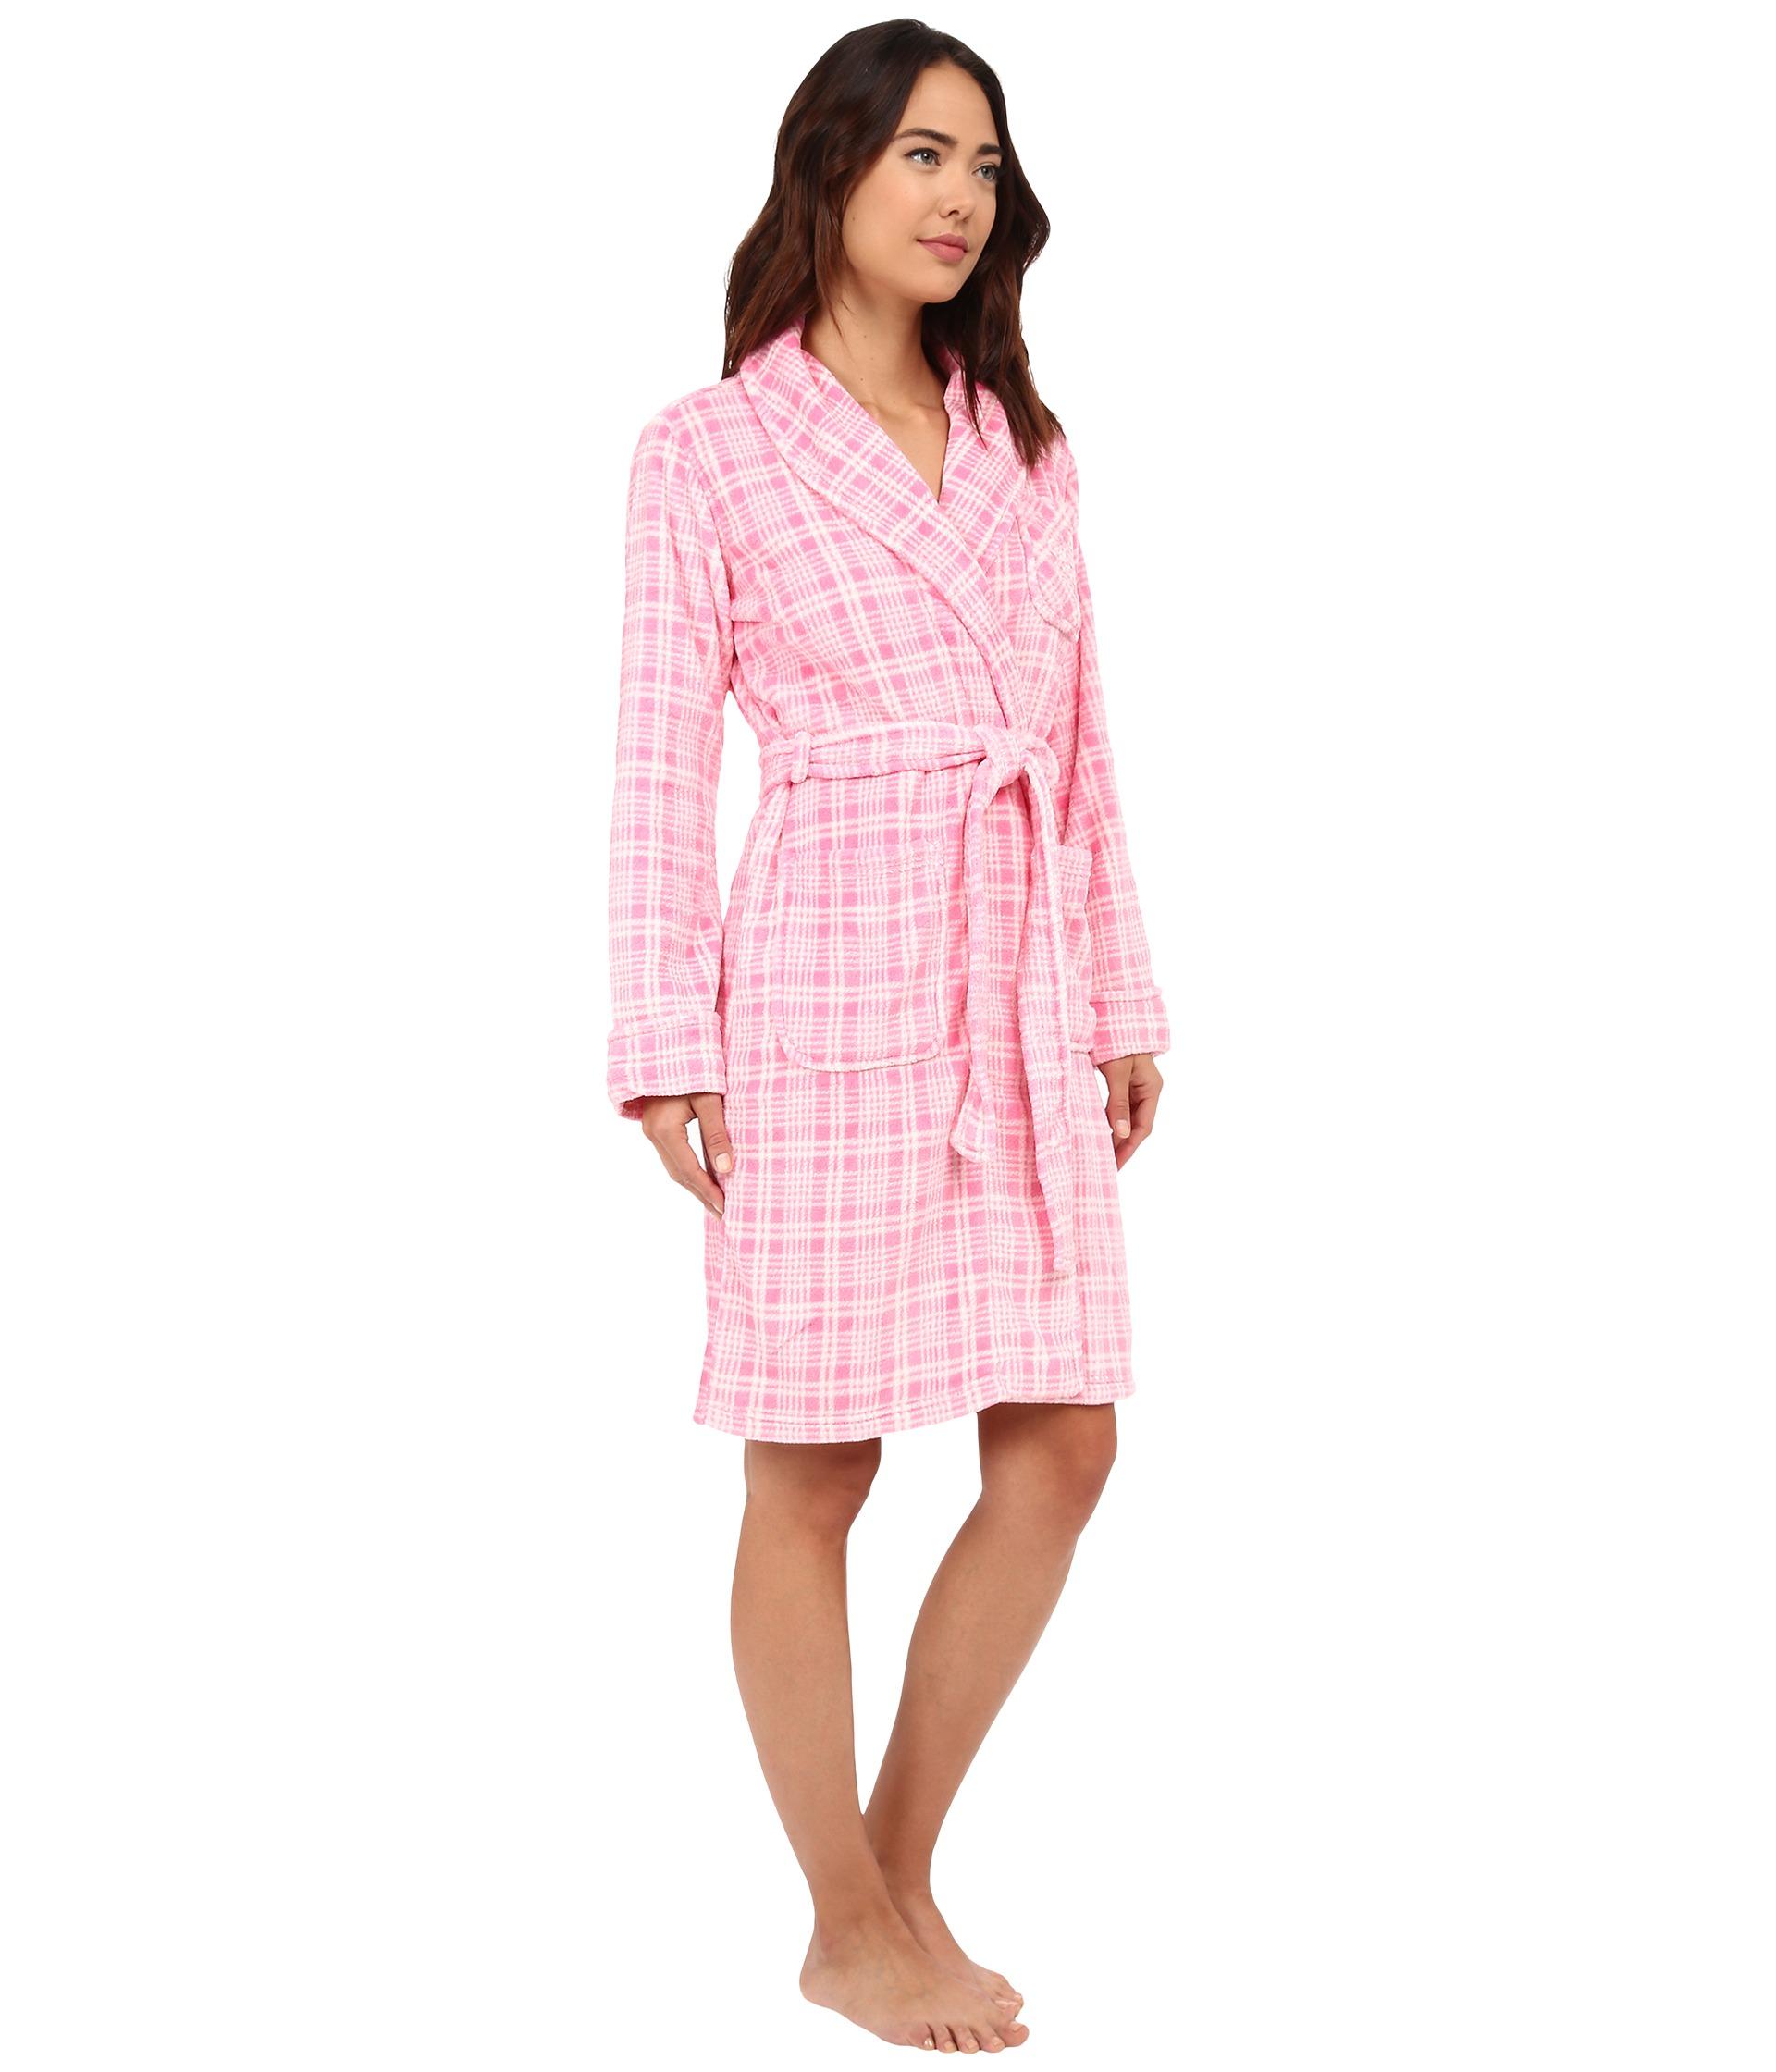 lauren ralph lauren so soft terry robe free shipping both ways. Black Bedroom Furniture Sets. Home Design Ideas